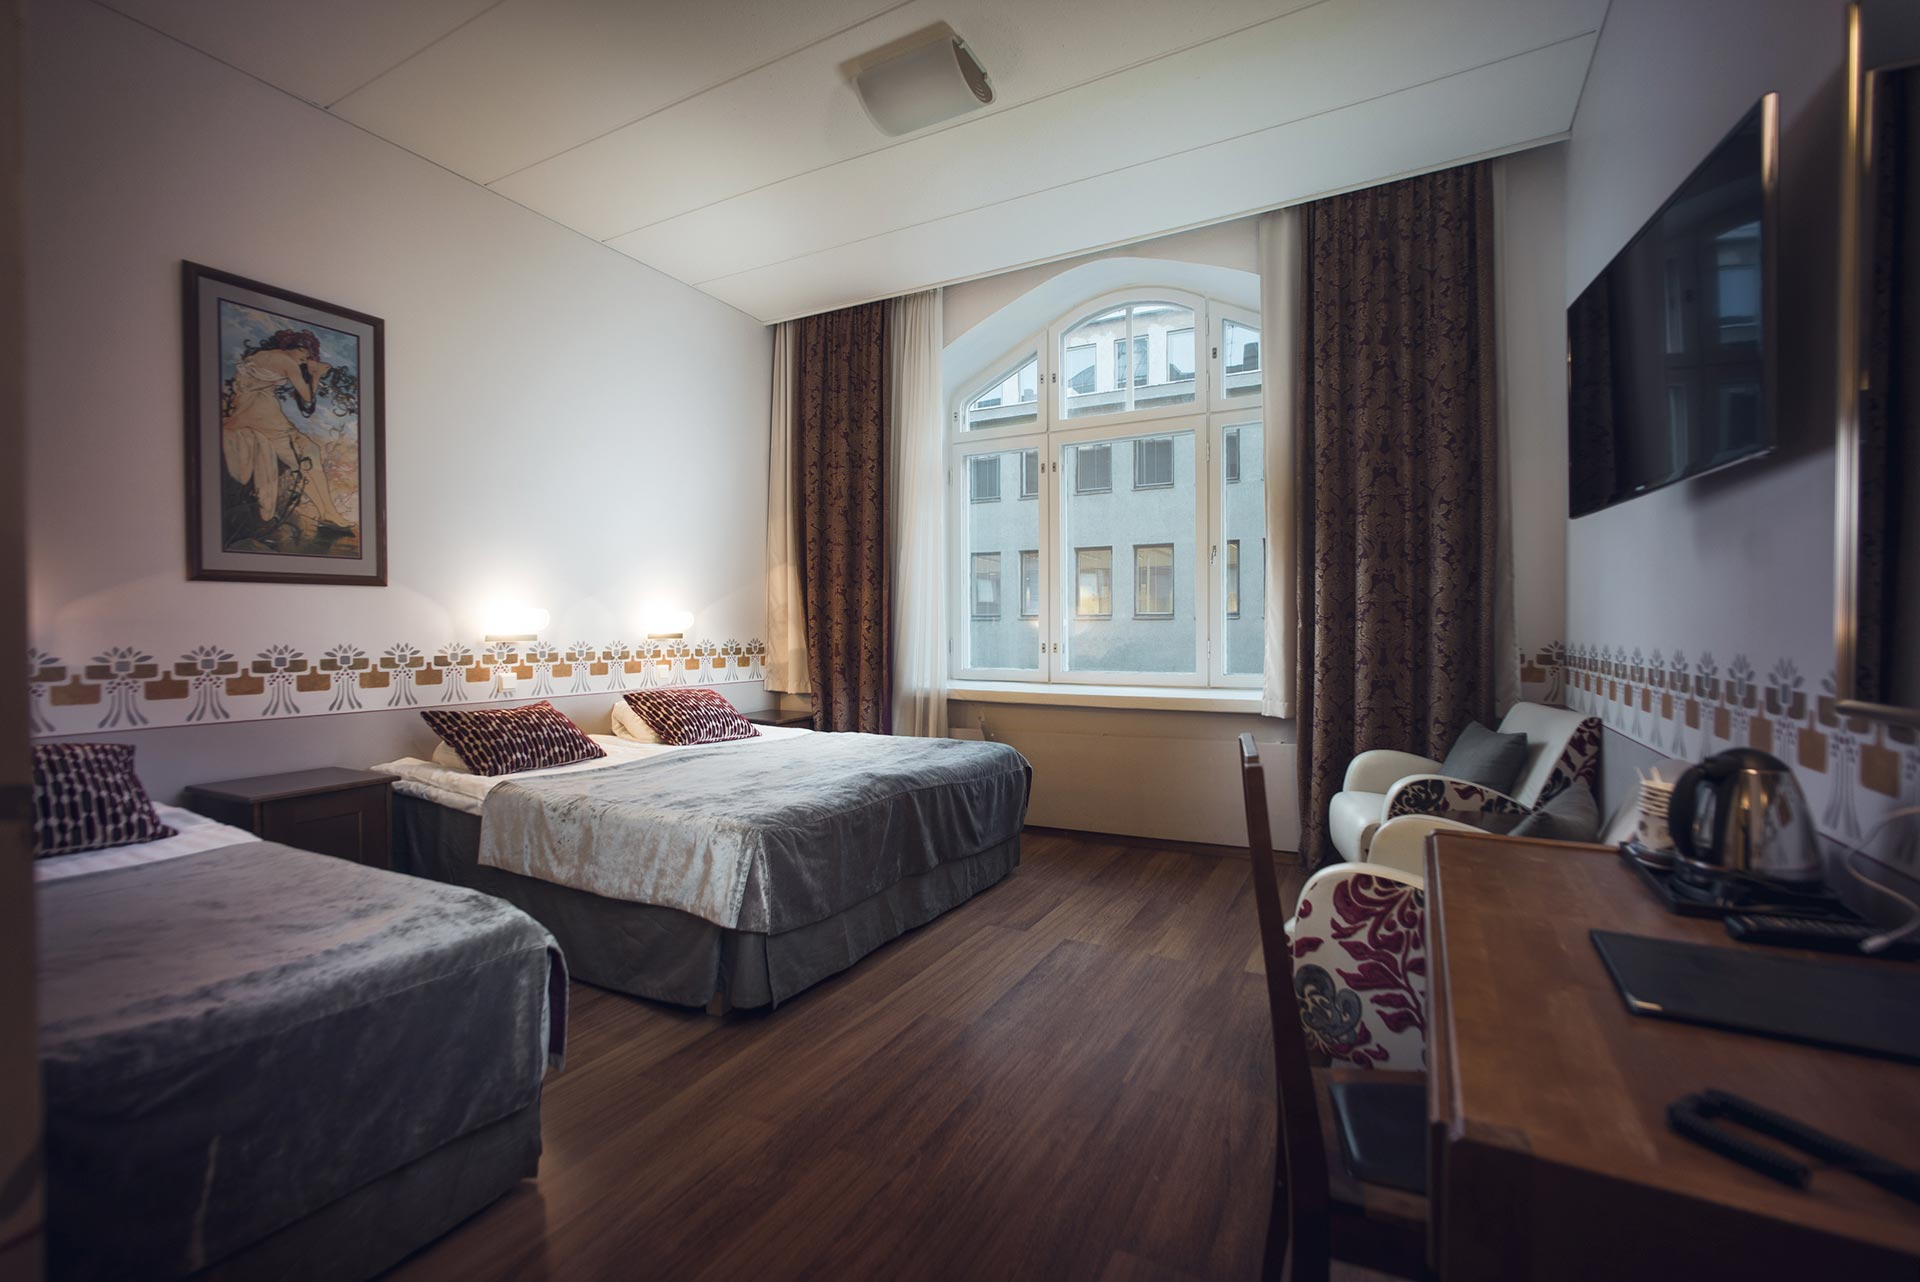 Hotel Arthur 3 hengen huone